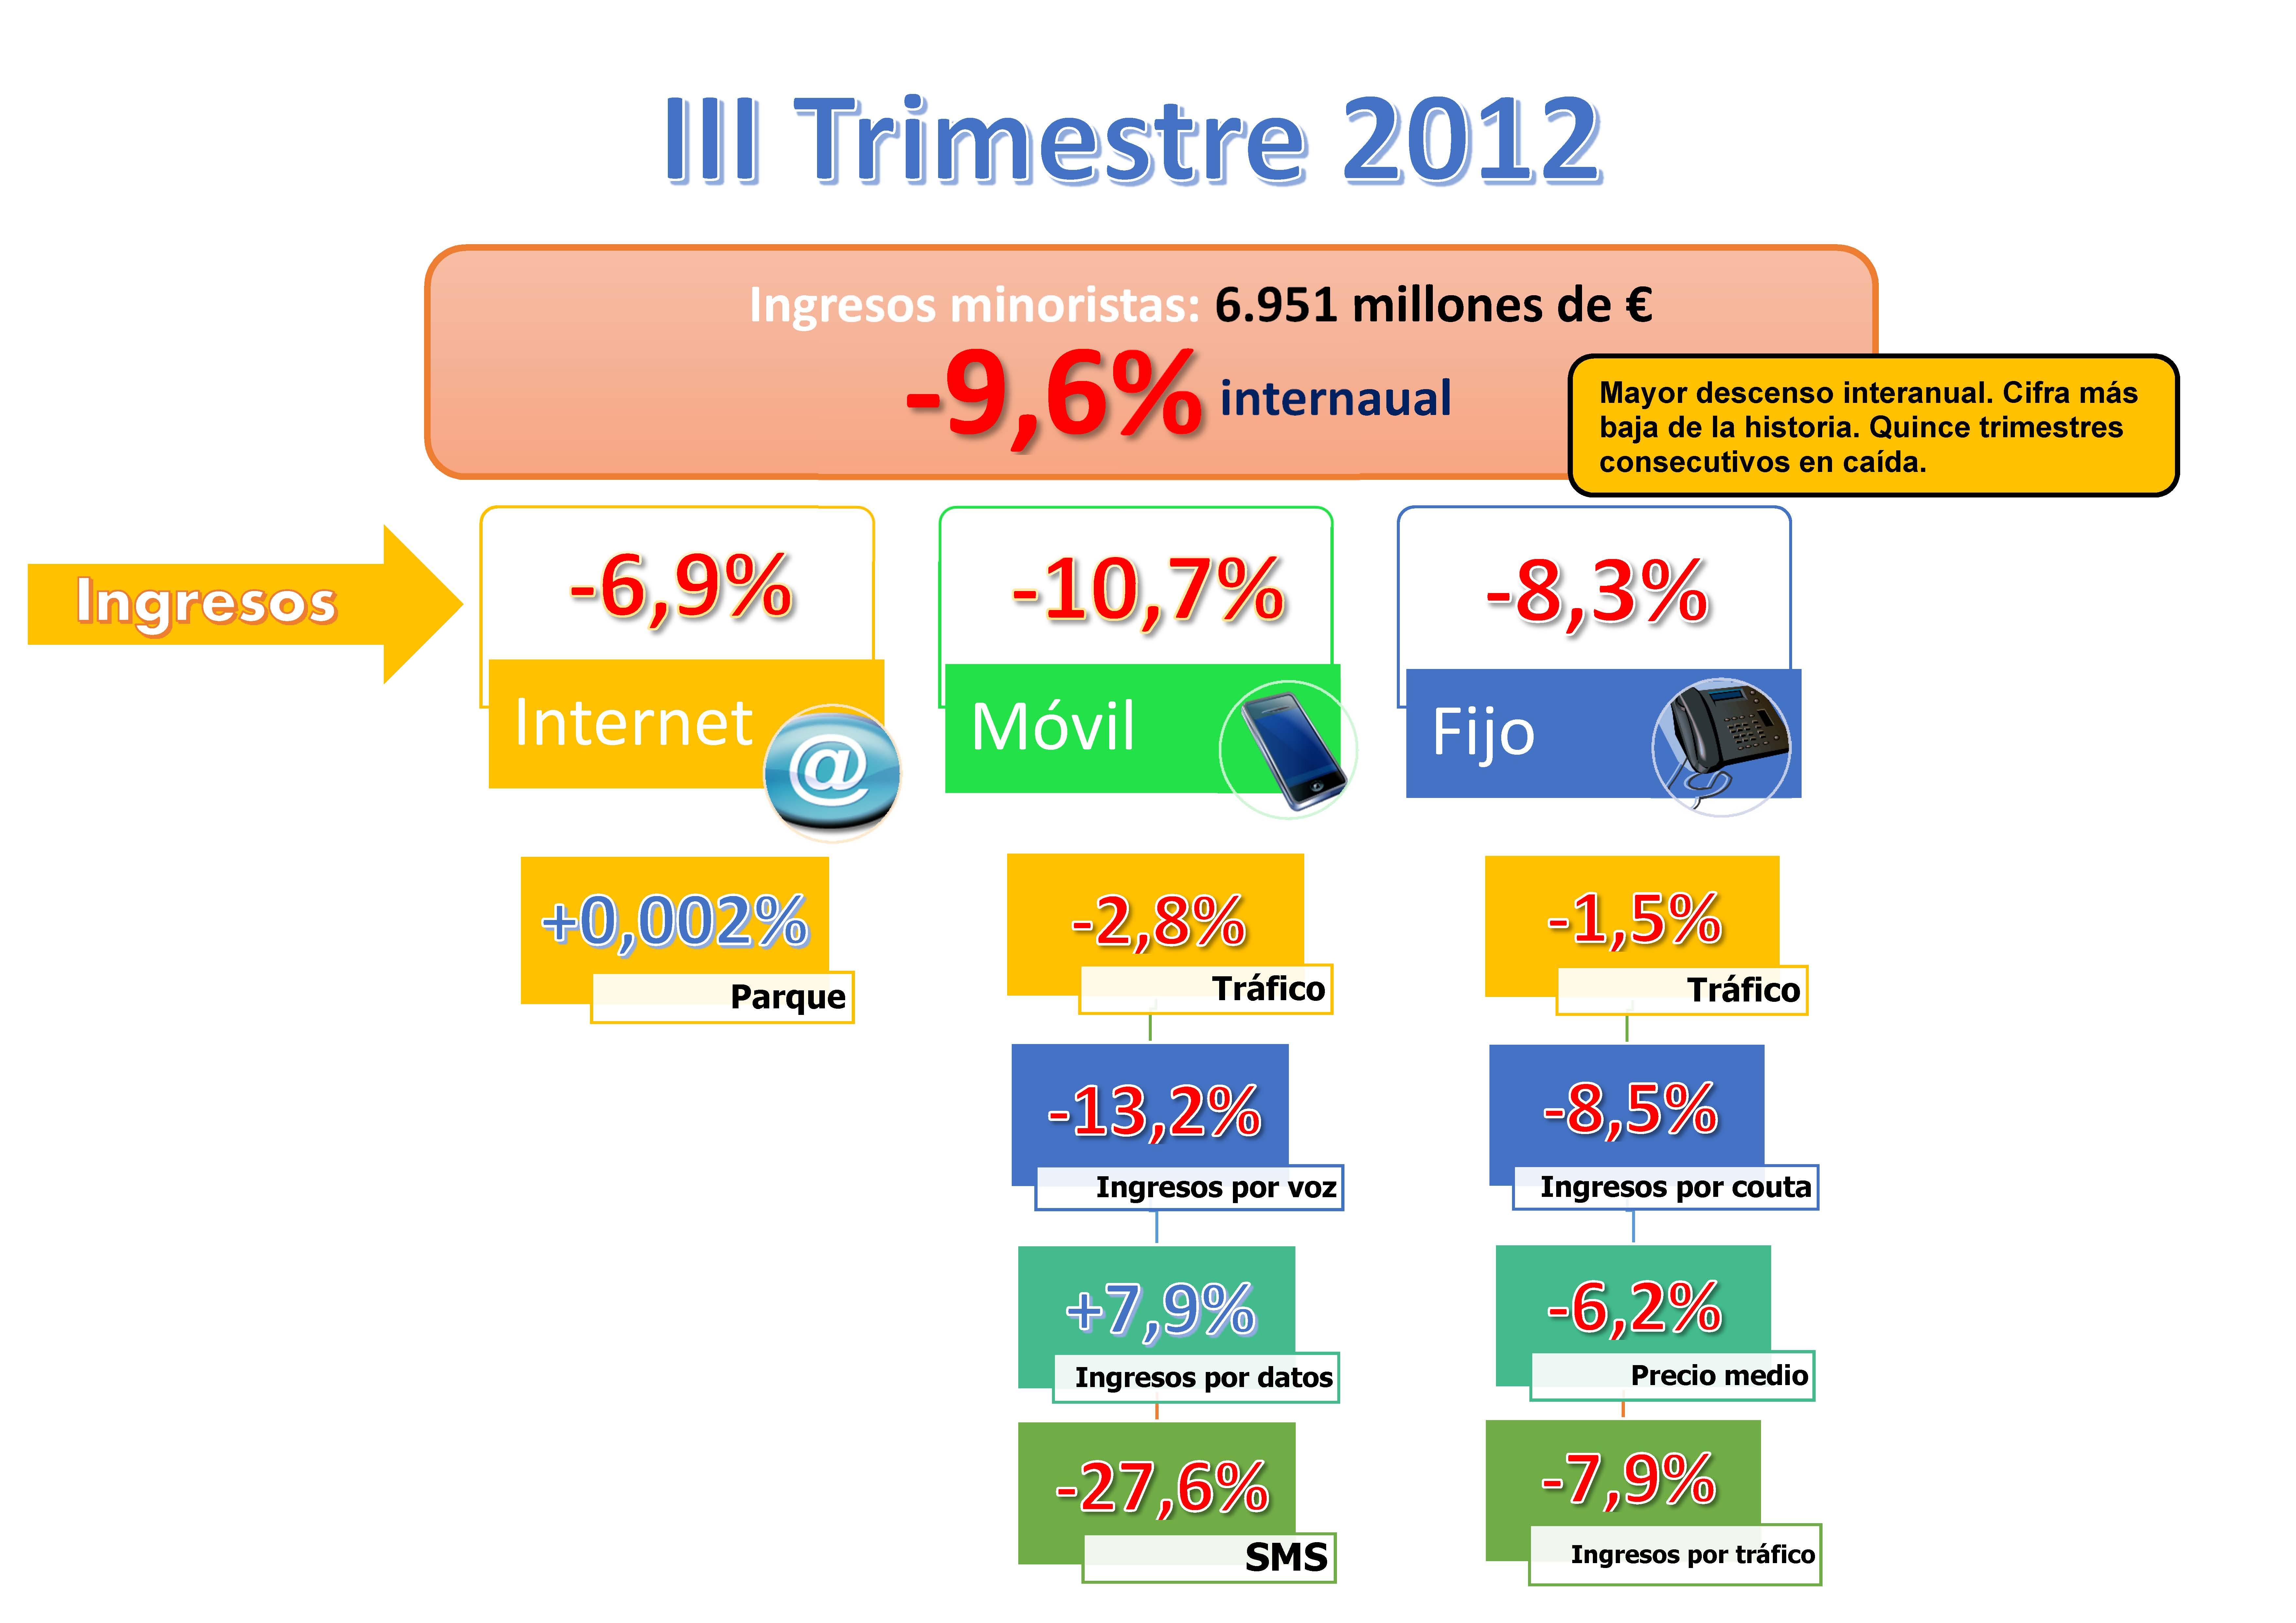 Infografia III Trimestre 2012